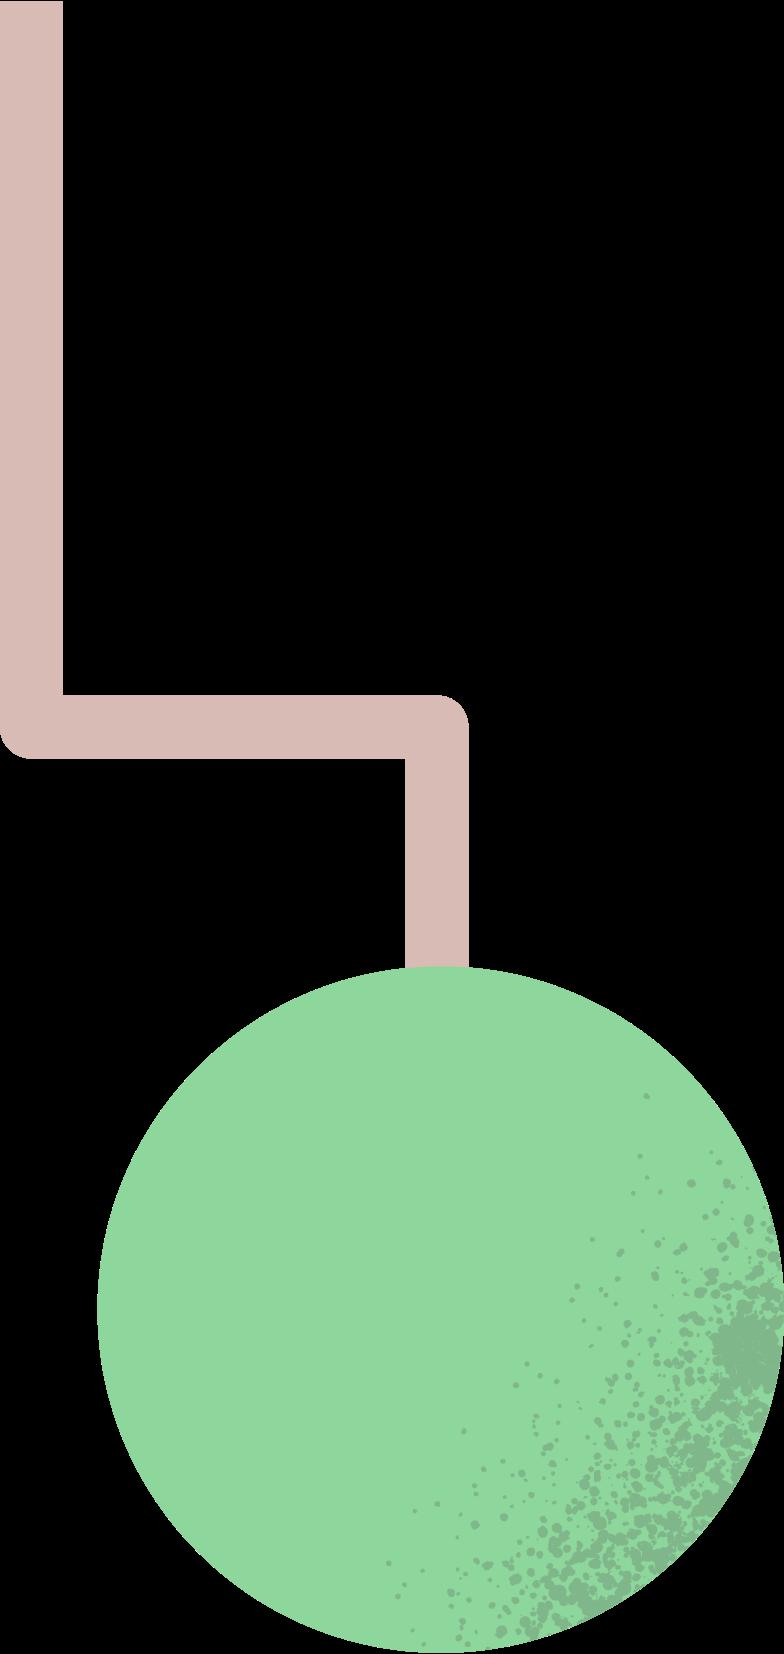 network-part Clipart illustration in PNG, SVG